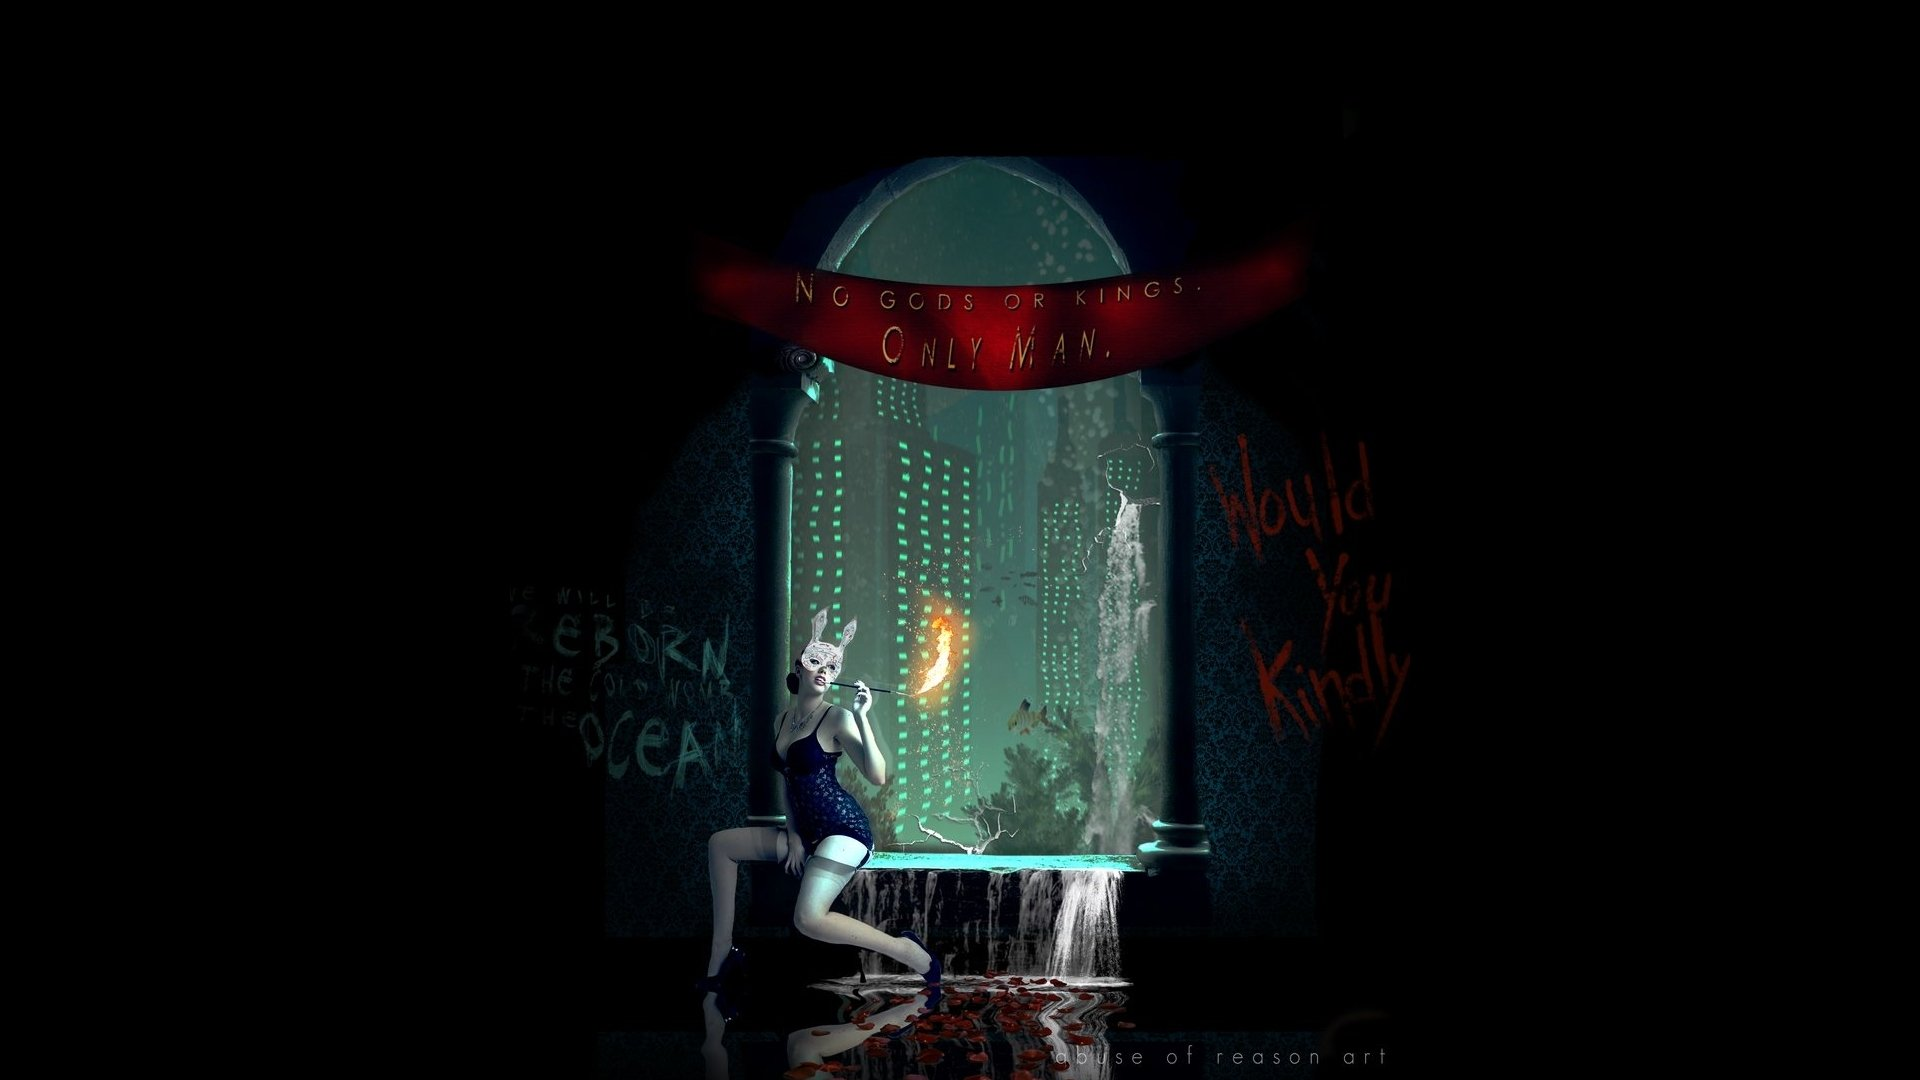 Video Game - Bioshock  Manipulation CGI Digital Art Cosplay Woman Sci Fi Wallpaper